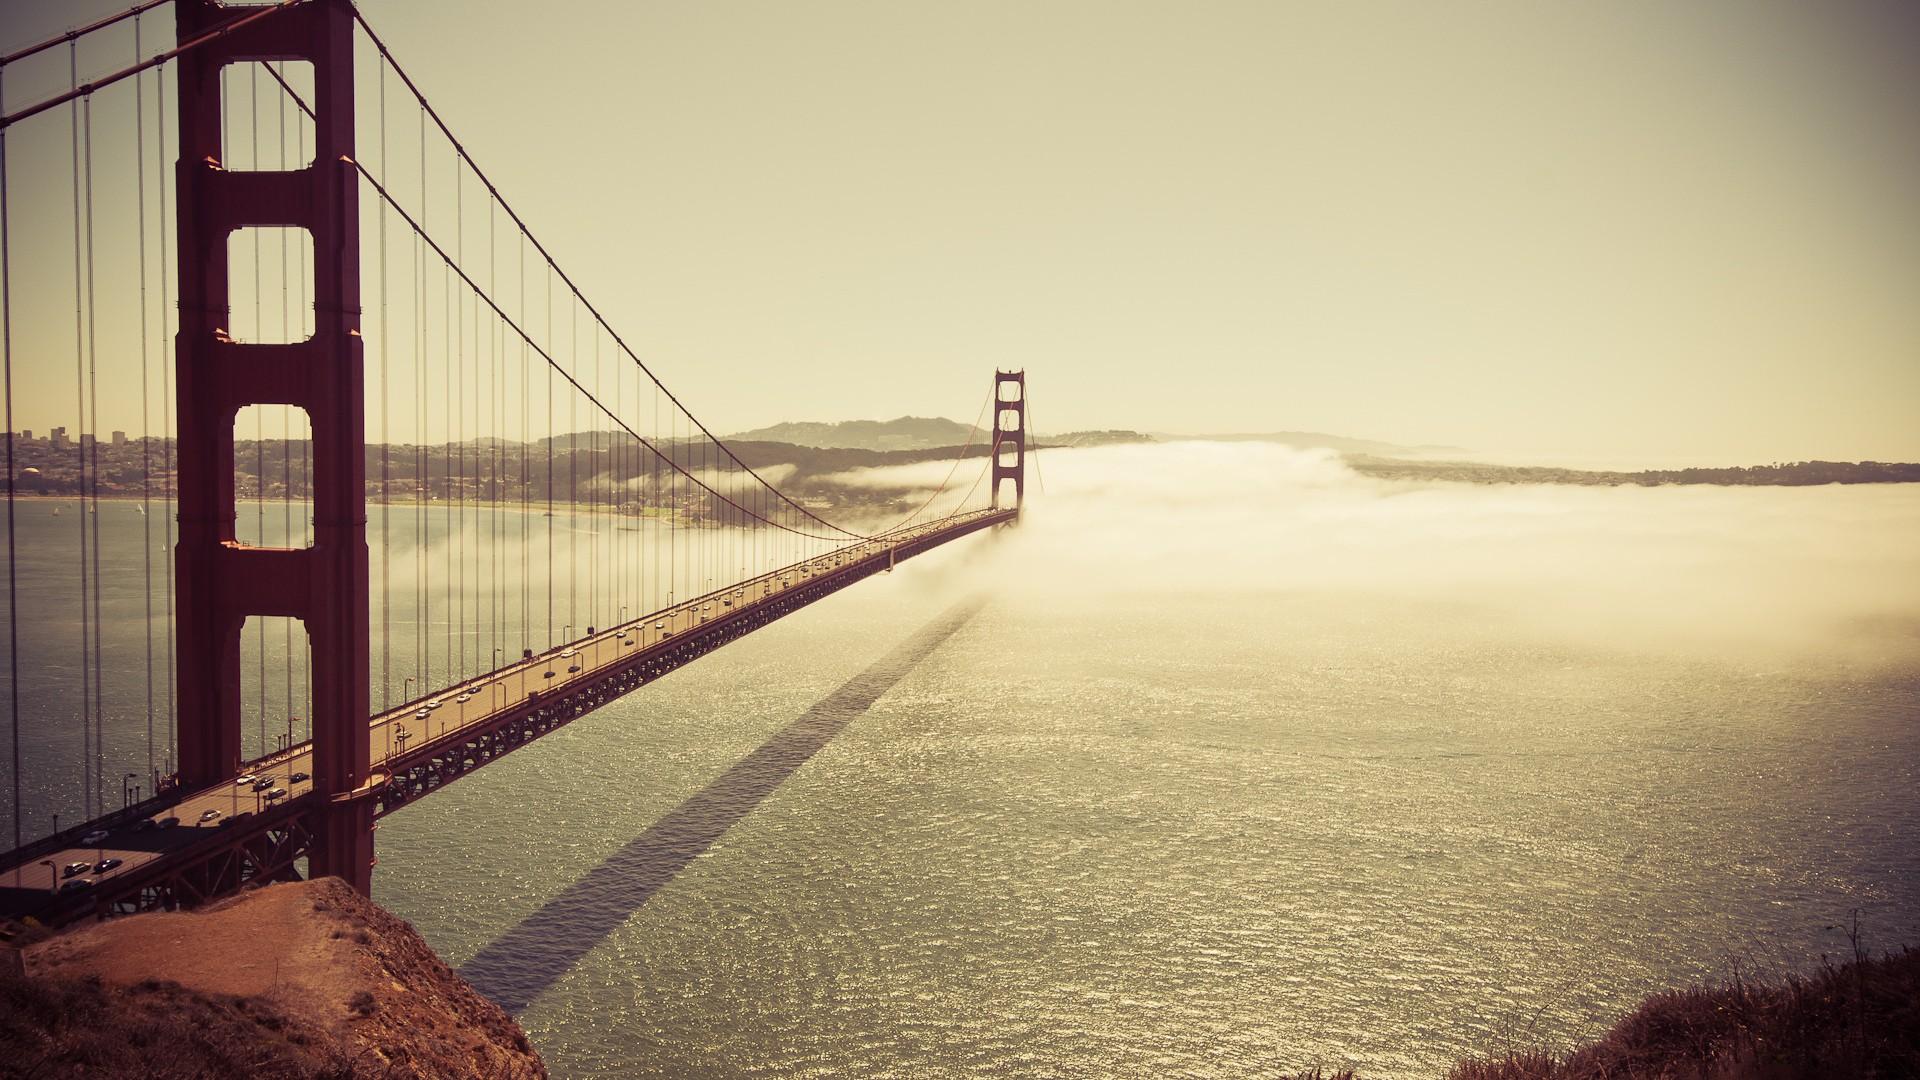 General 1920x1080 bridge San Francisco Golden Gate Bridge USA sea water architecture